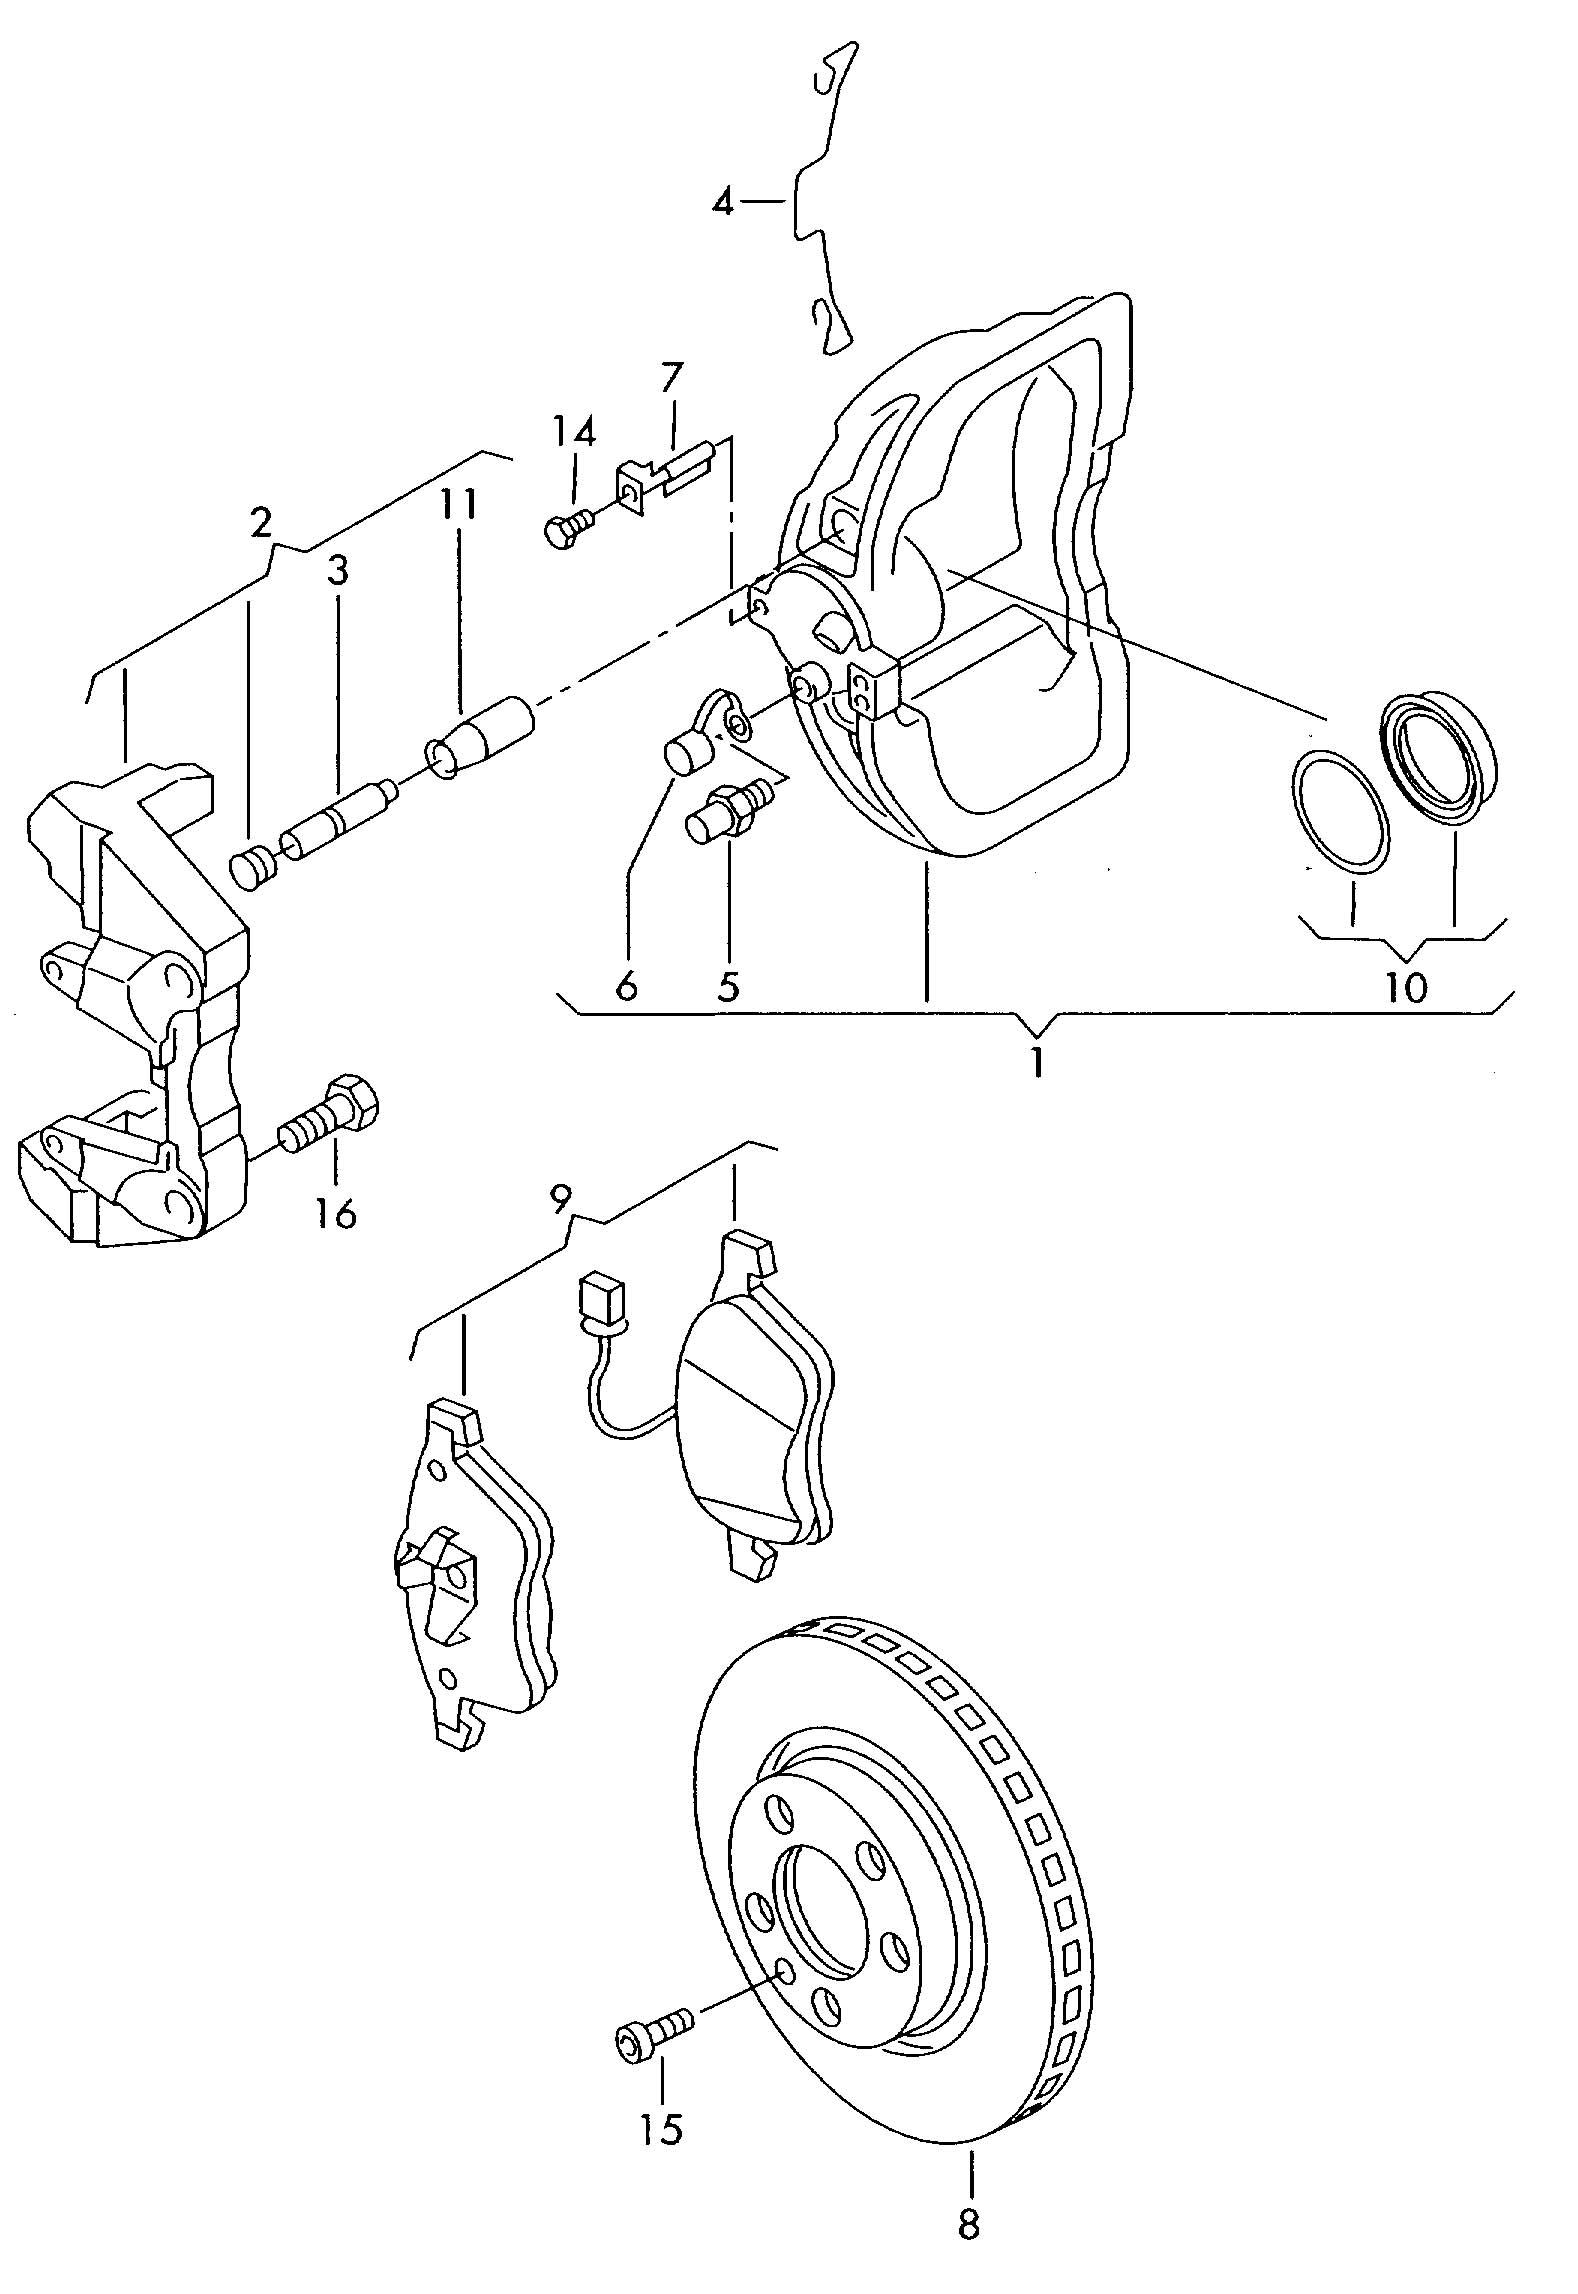 Volkswagen EuroVan 2.8L 6 Cylinder Rotor, Brake